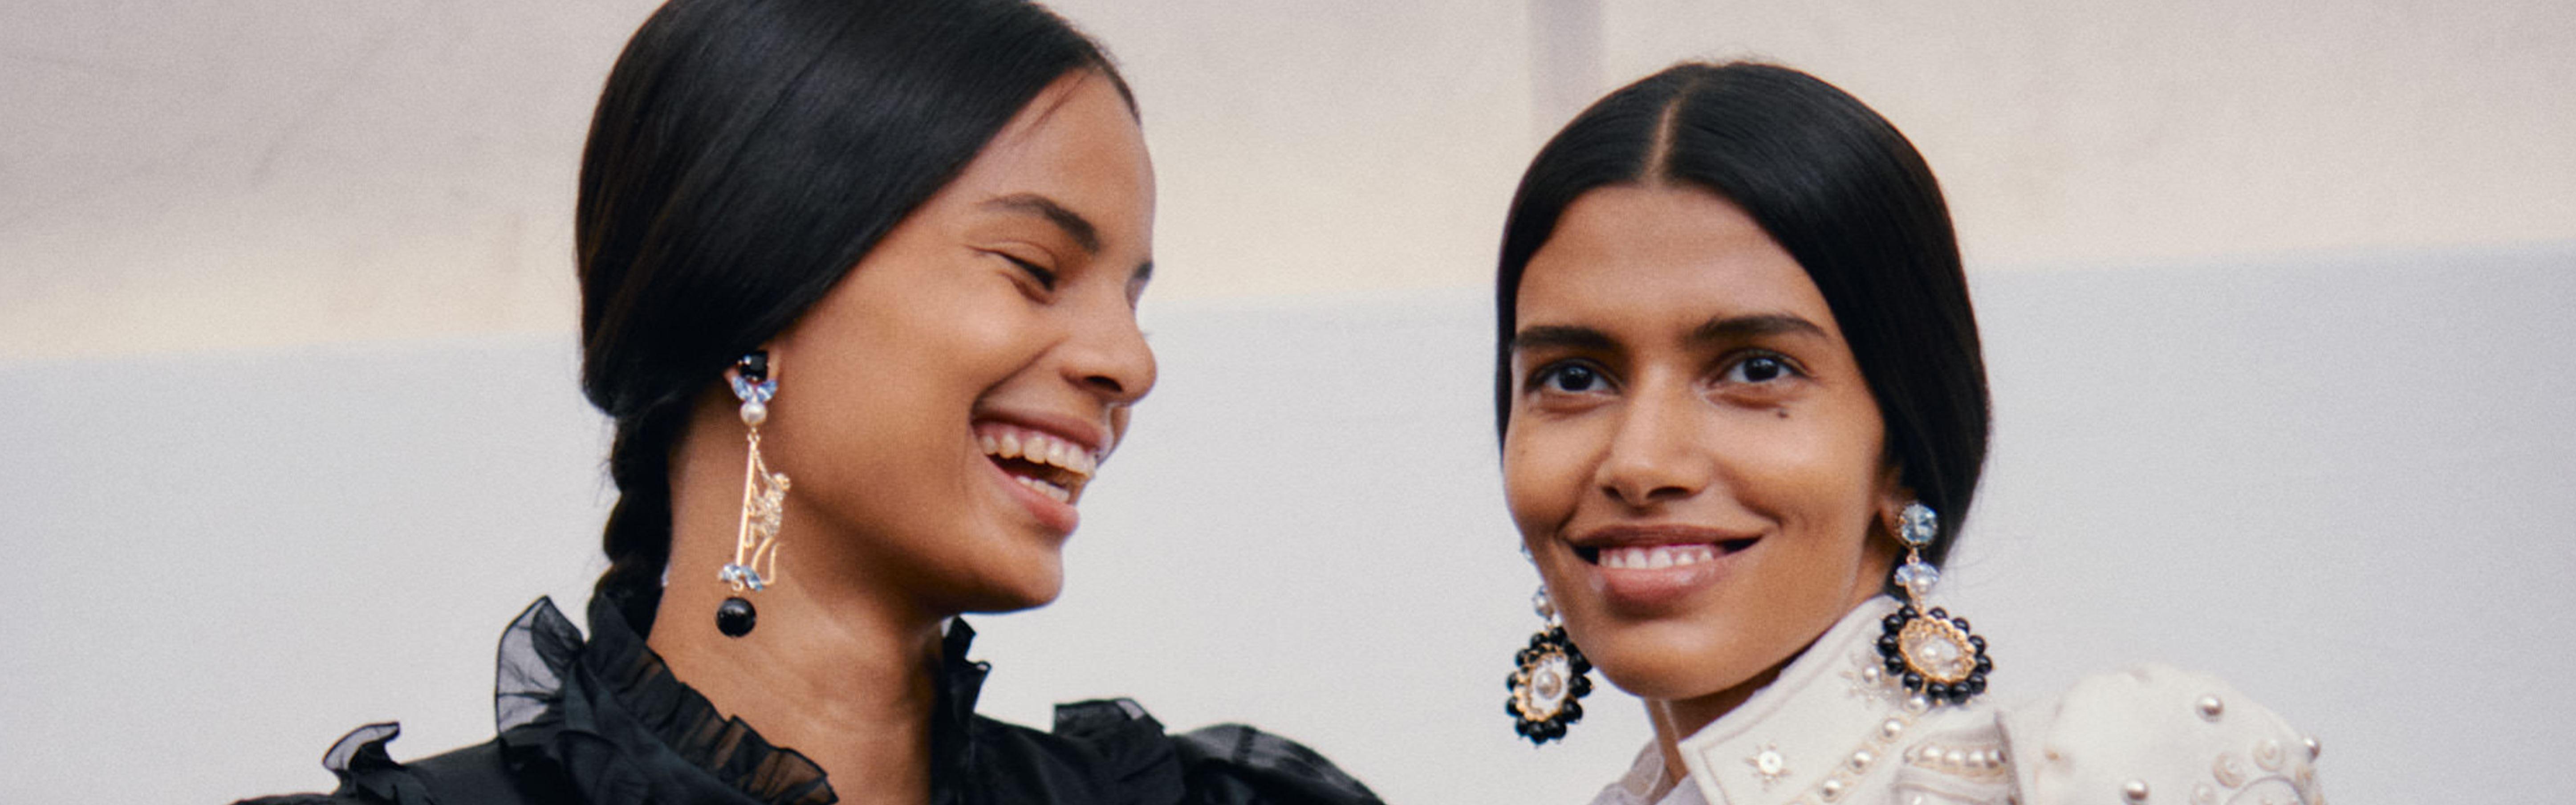 Models in bold, statement earrings from luxury designer ERDEM's beautiful jewellery selection.